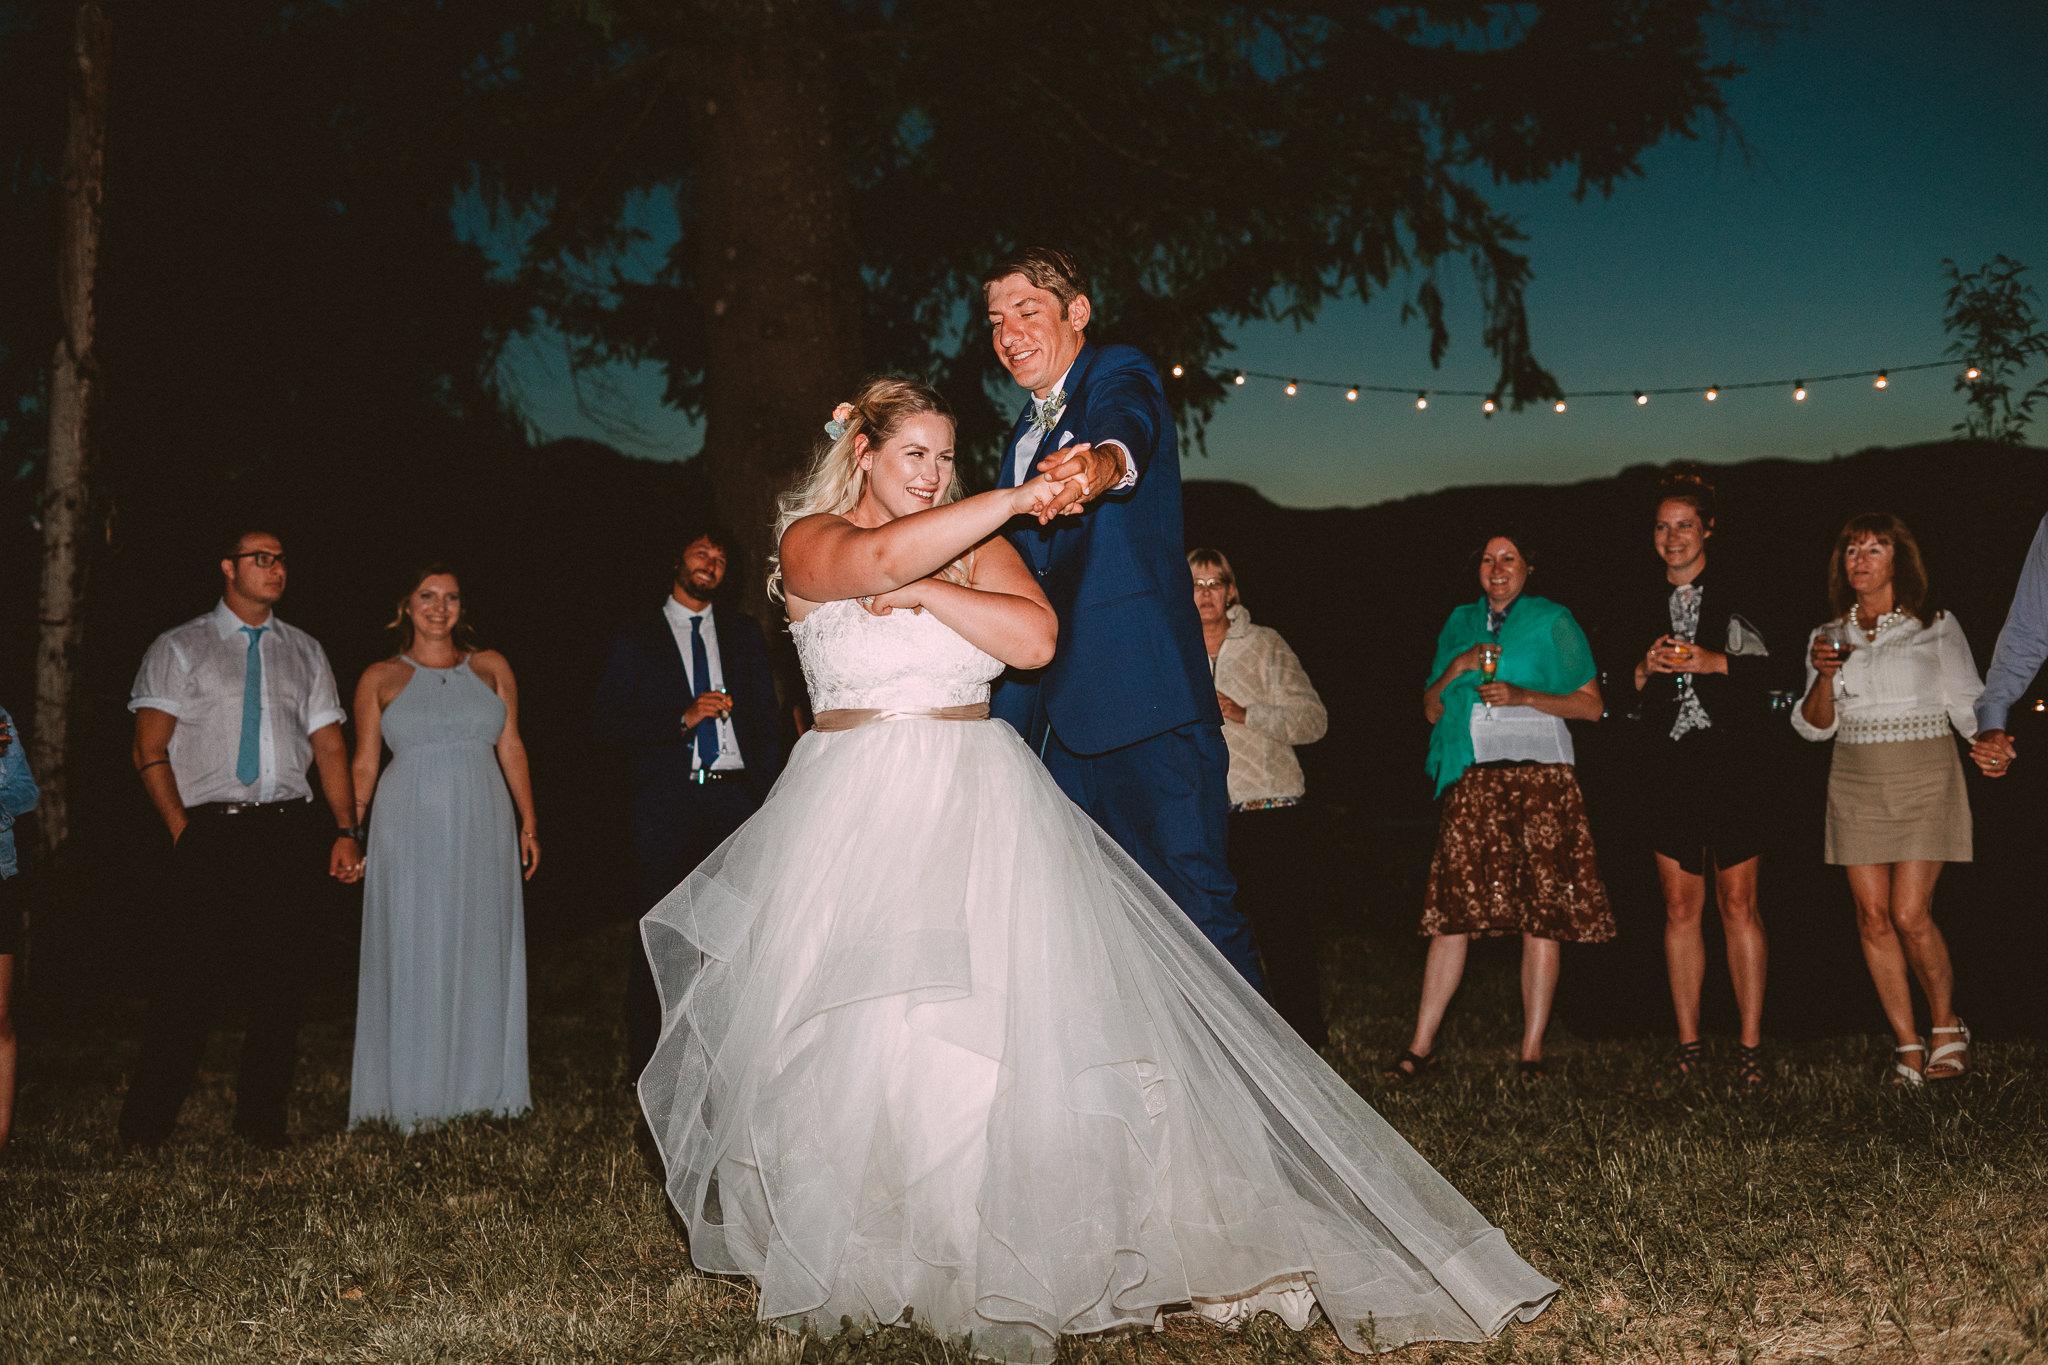 Bride Groom twirl outdoor First Dance Columbia Gorge Backyard wedding